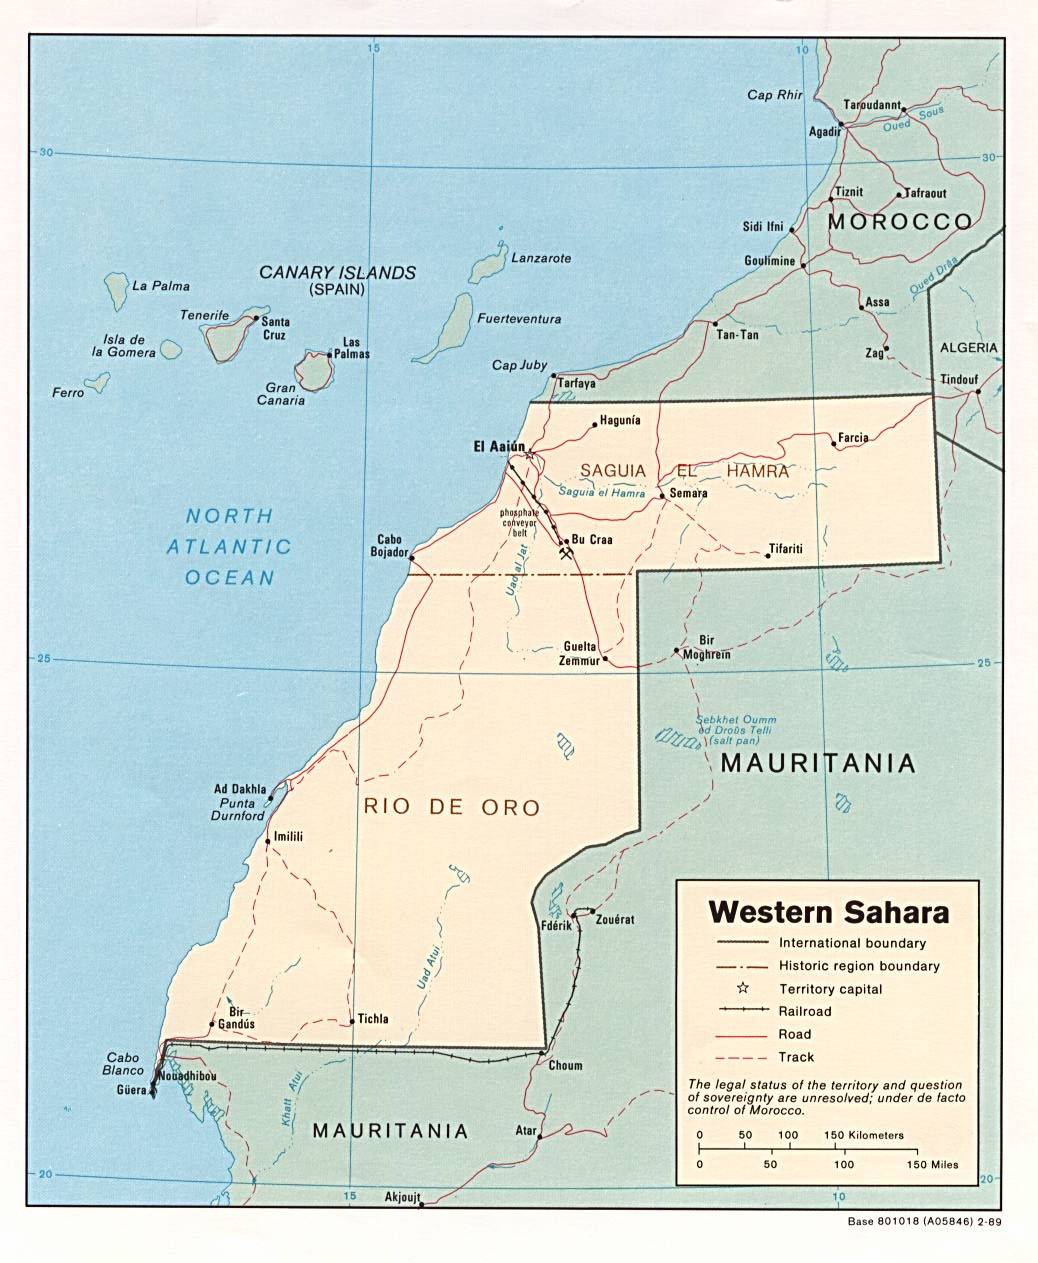 Mapa Politico del Sahara Occidental